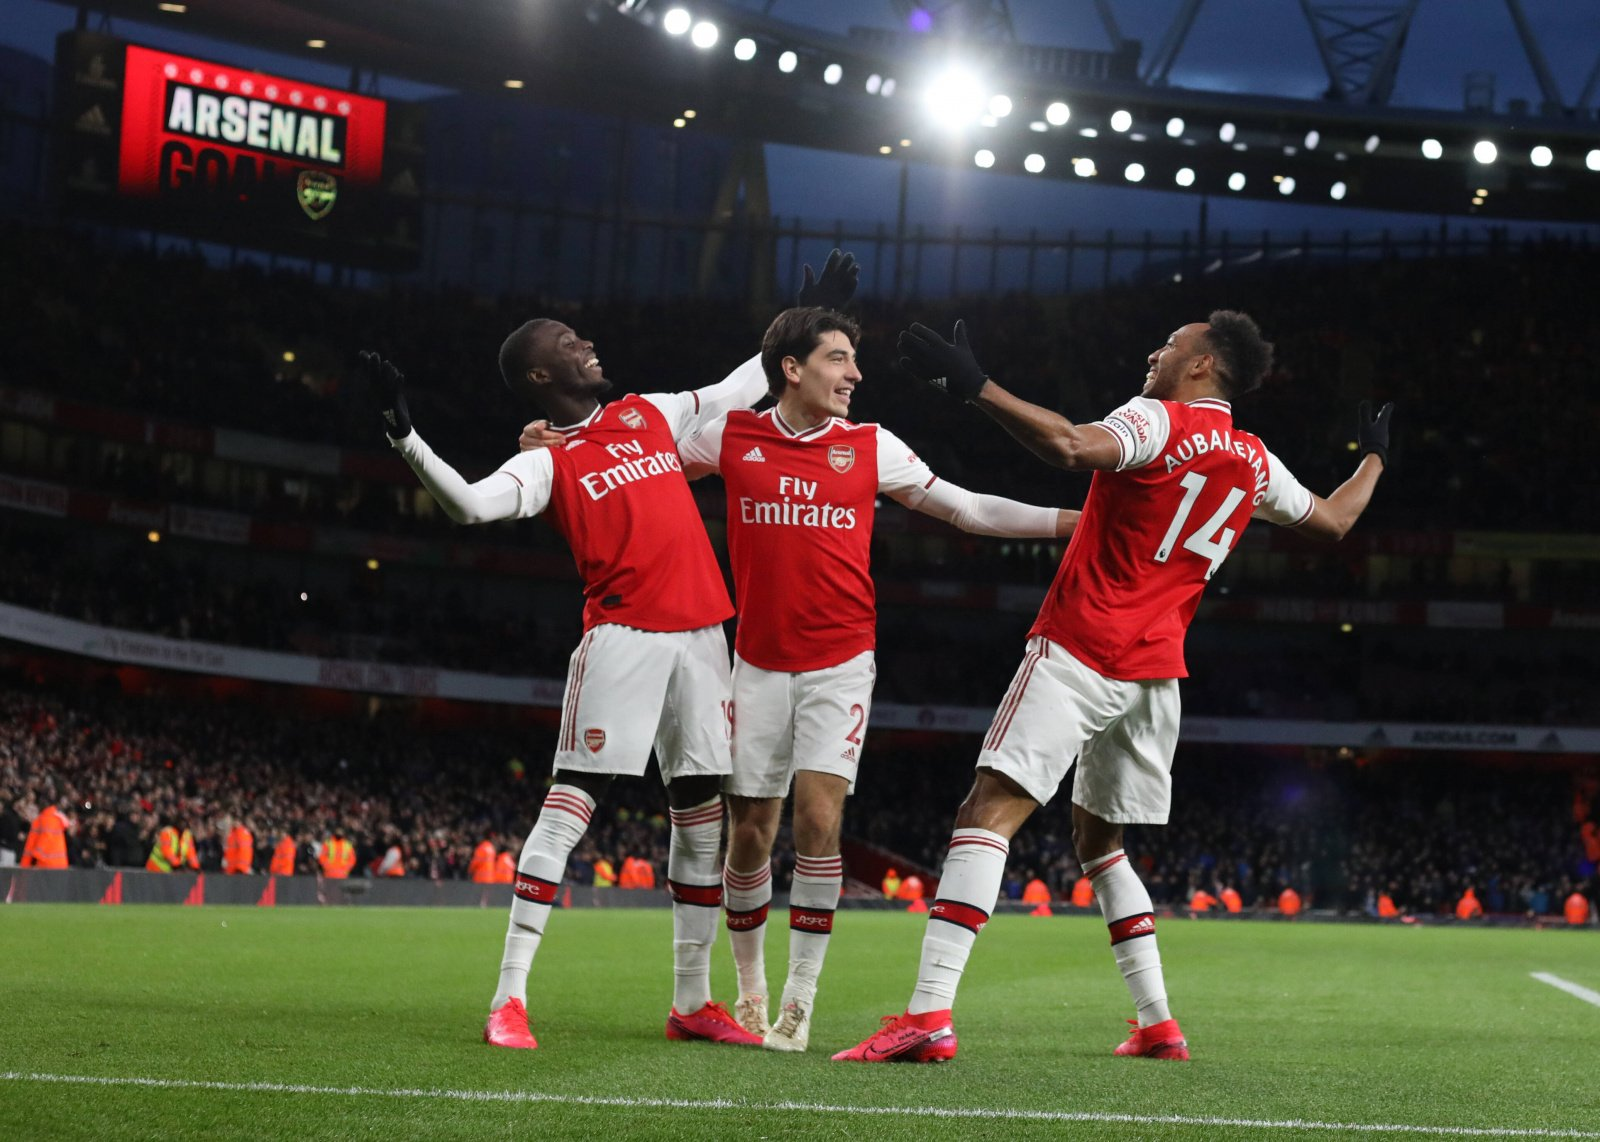 «Мольде» – «Арсенал»: прогноз и ставка. Хозяева потреплют нервы фавориту